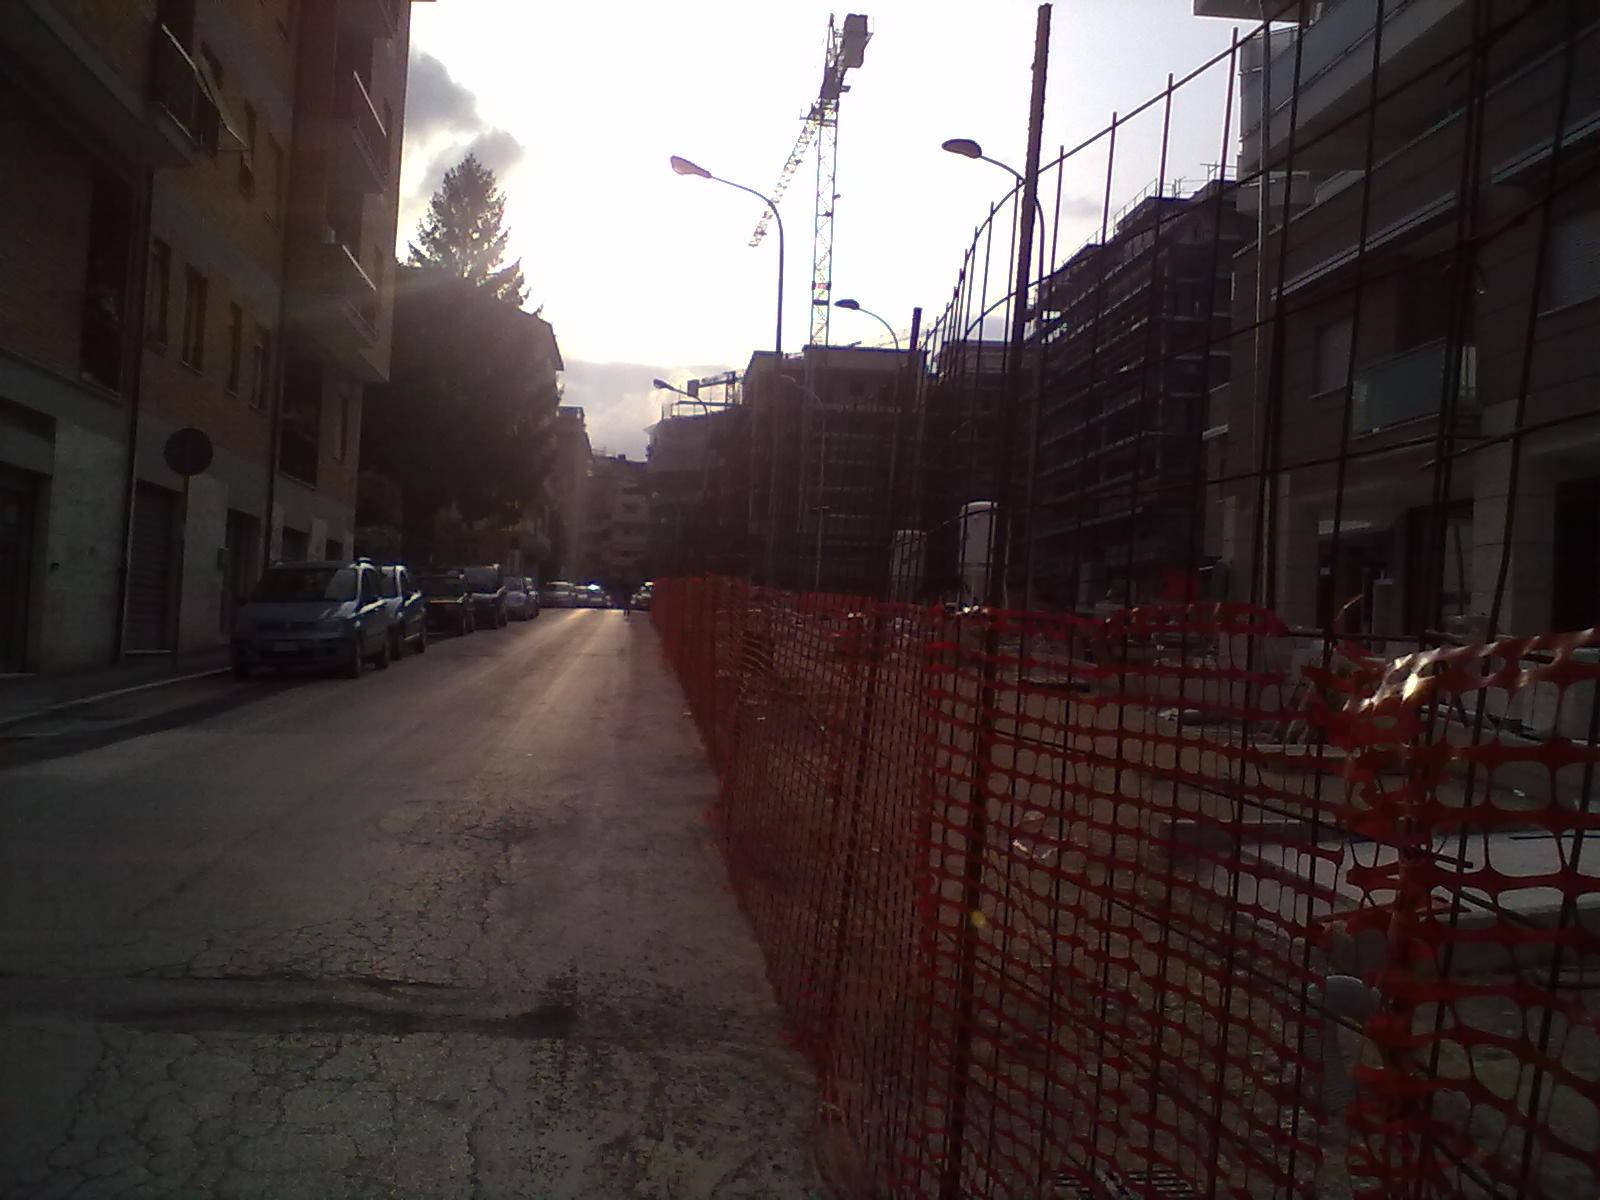 Via Firenze